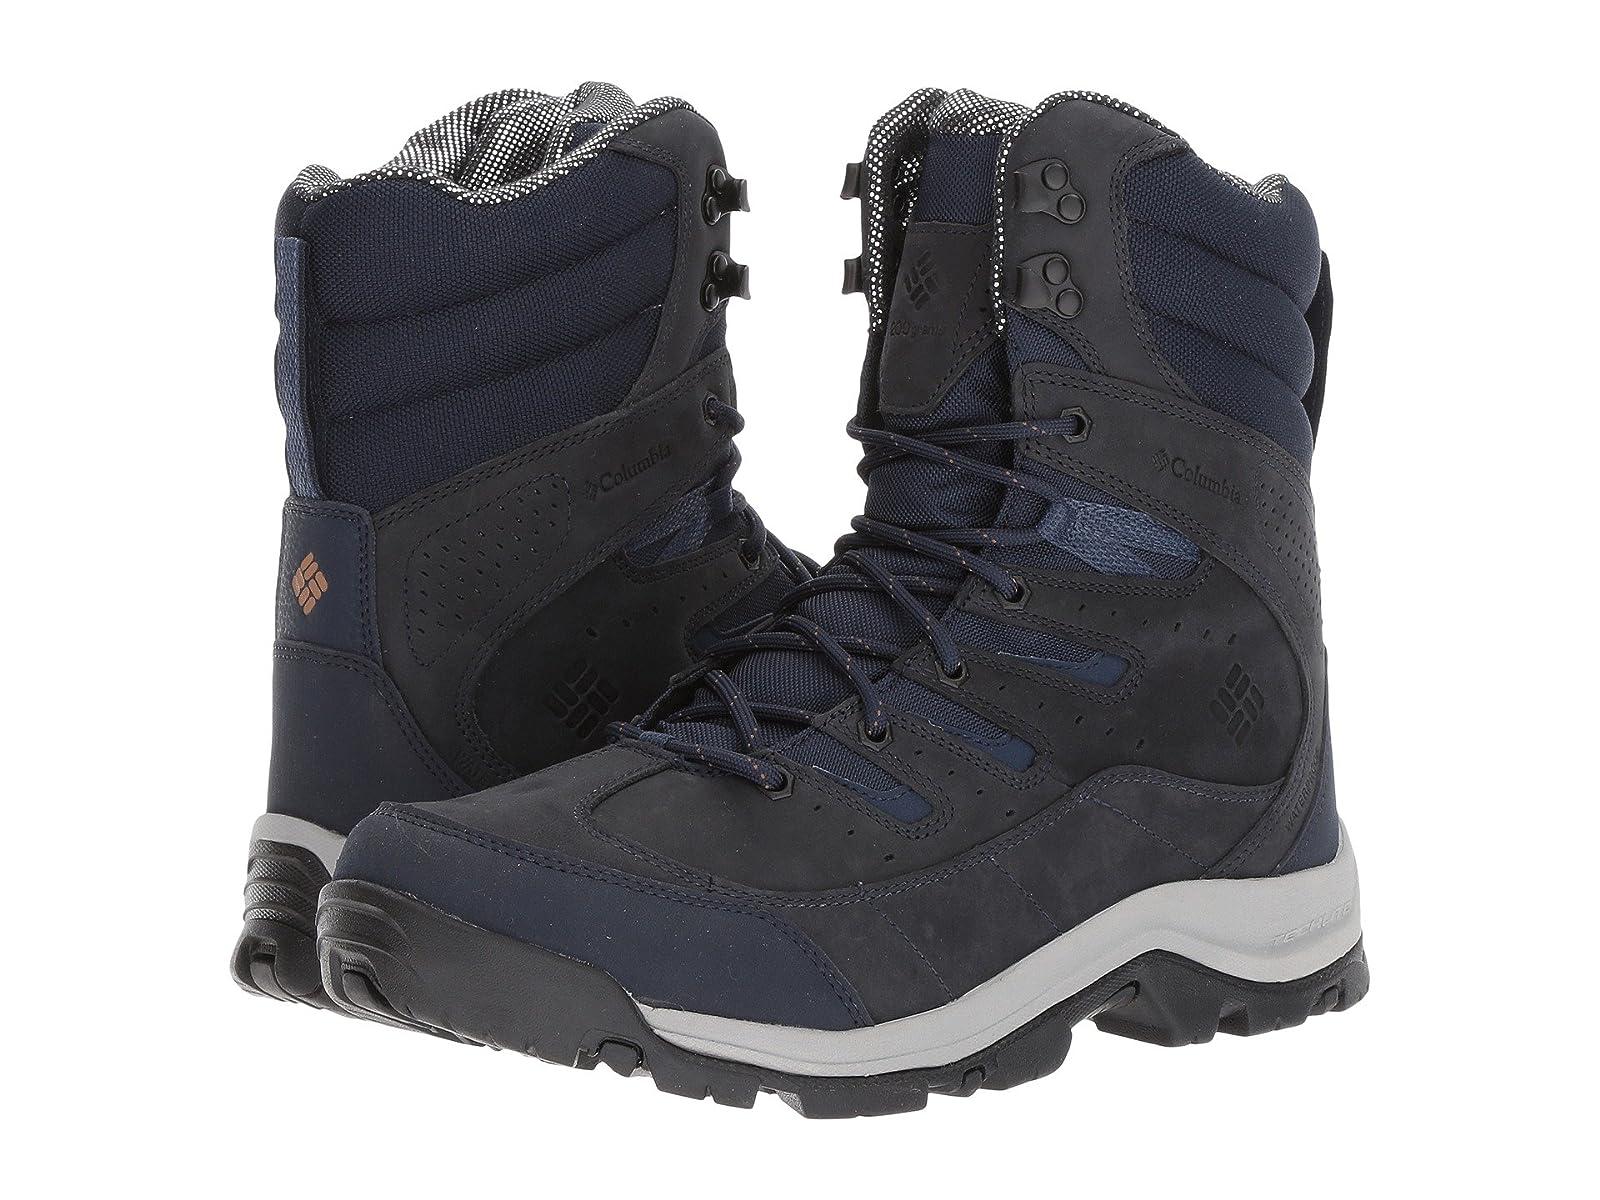 Columbia Gunnison Plus LTR Omni-HeatCheap and distinctive eye-catching shoes